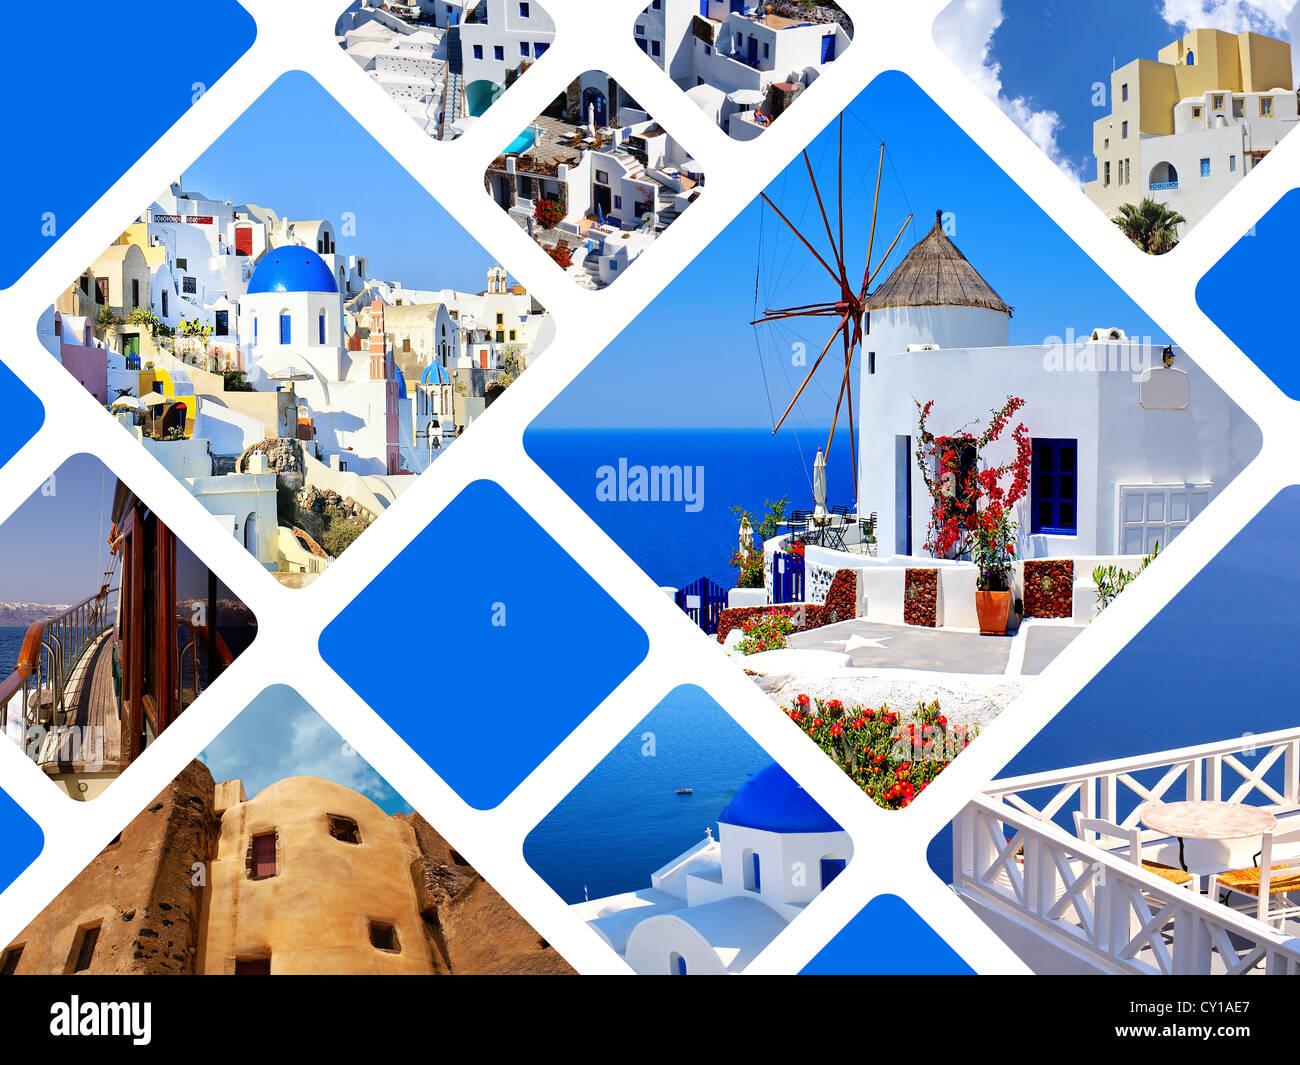 Collage of summer photos in Santorini island, Greece - Stock Image